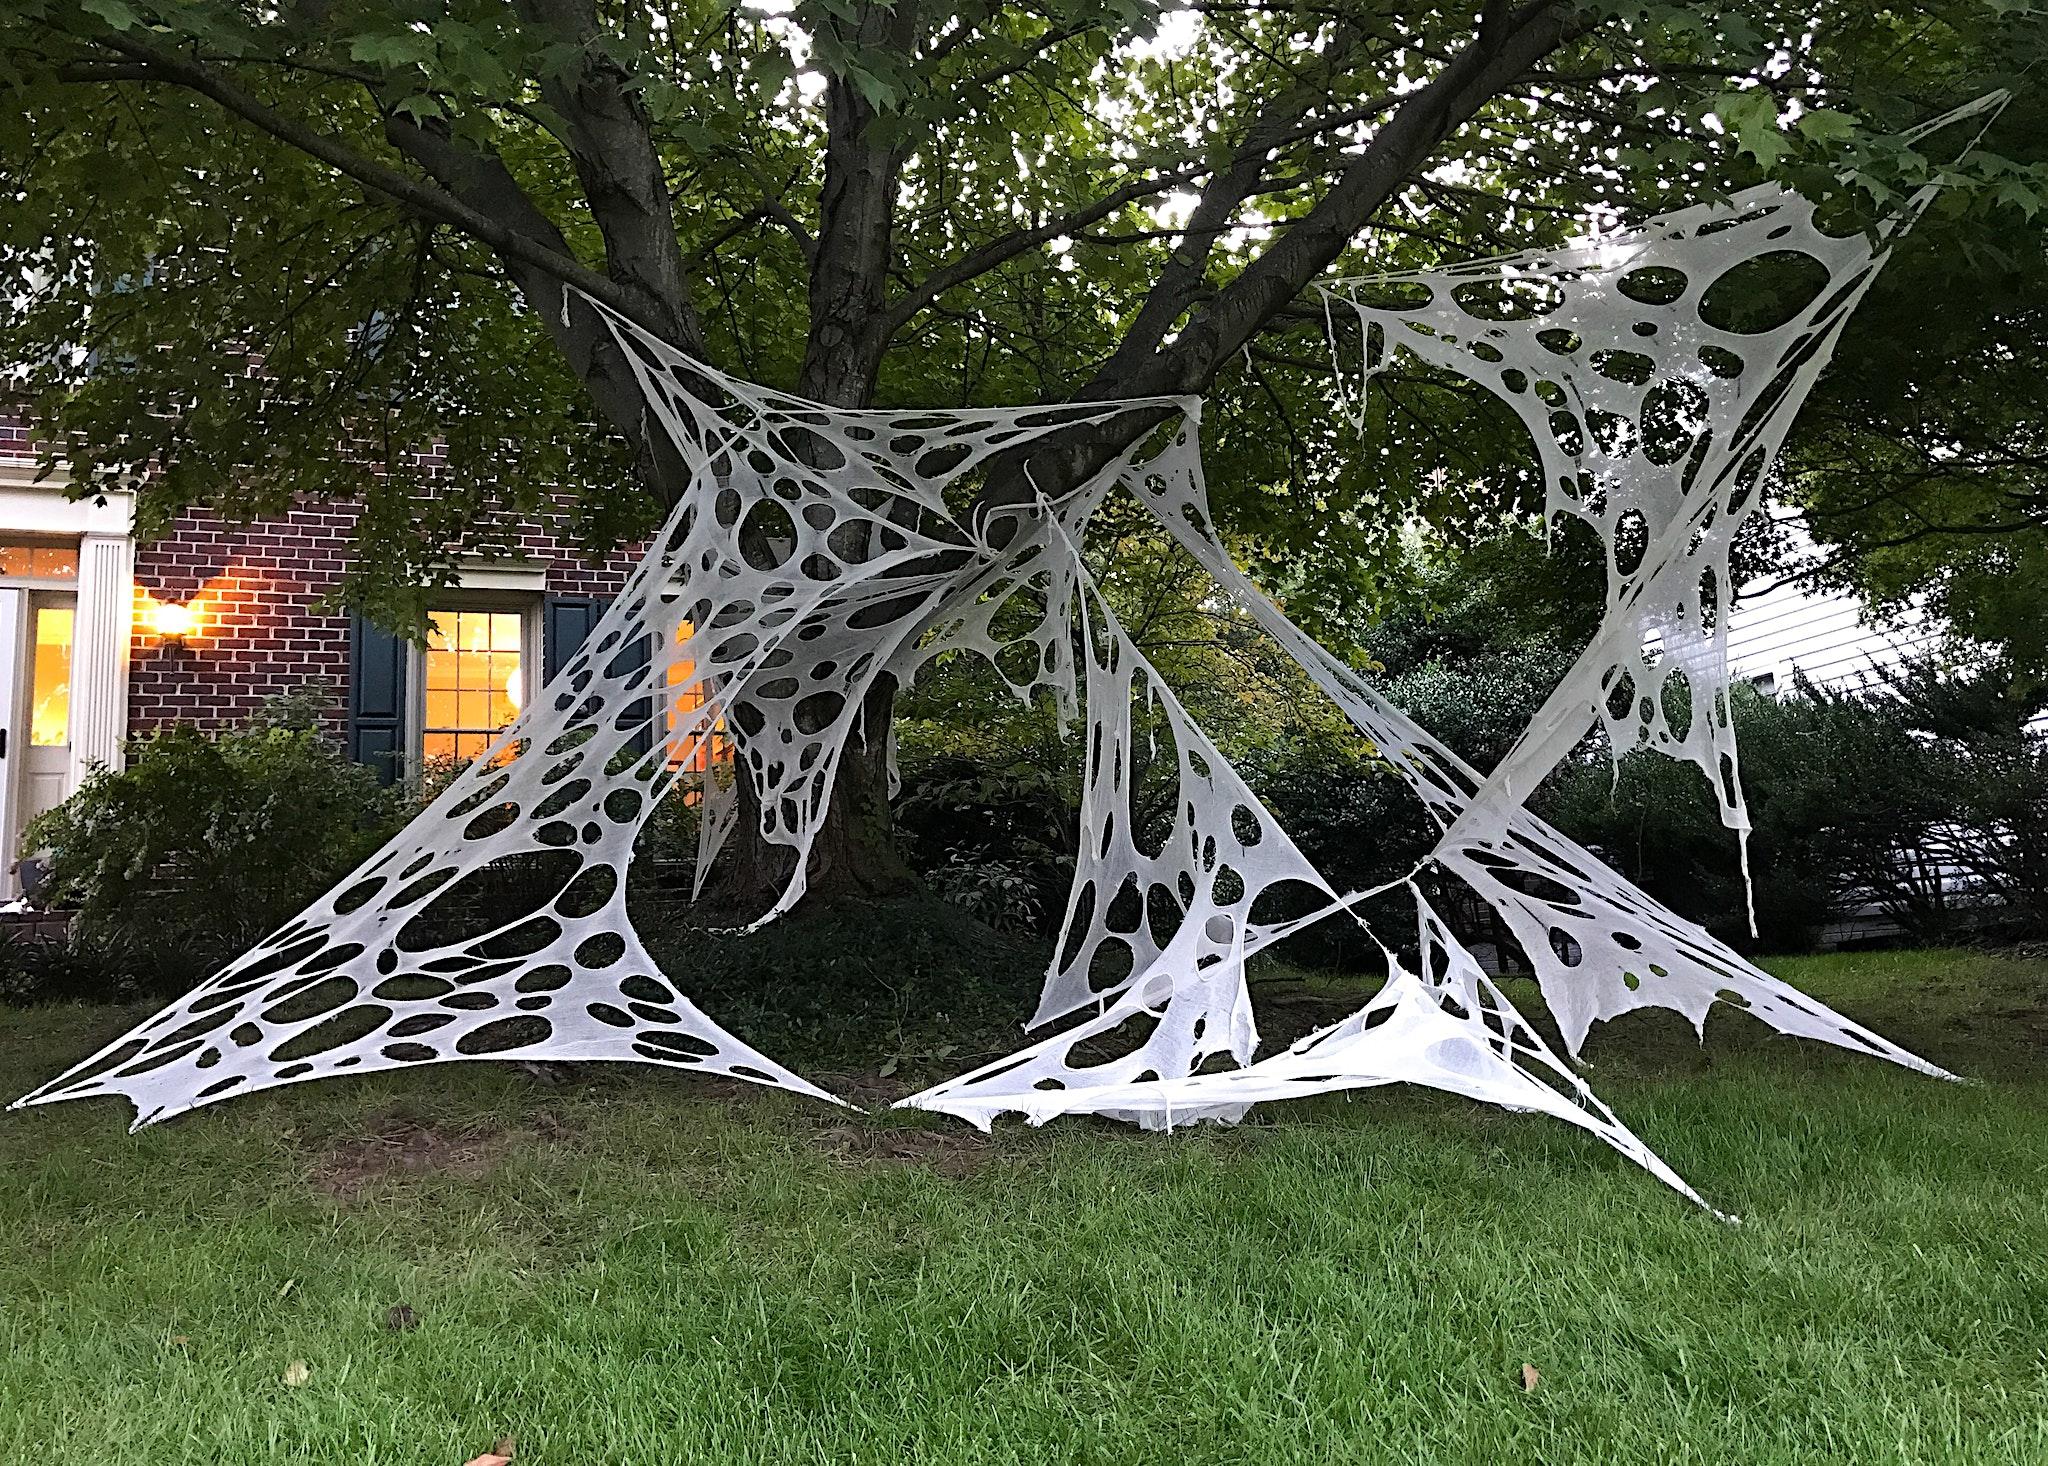 How To Make Giant Halloween Spider Webs - DIY Halloween Decor